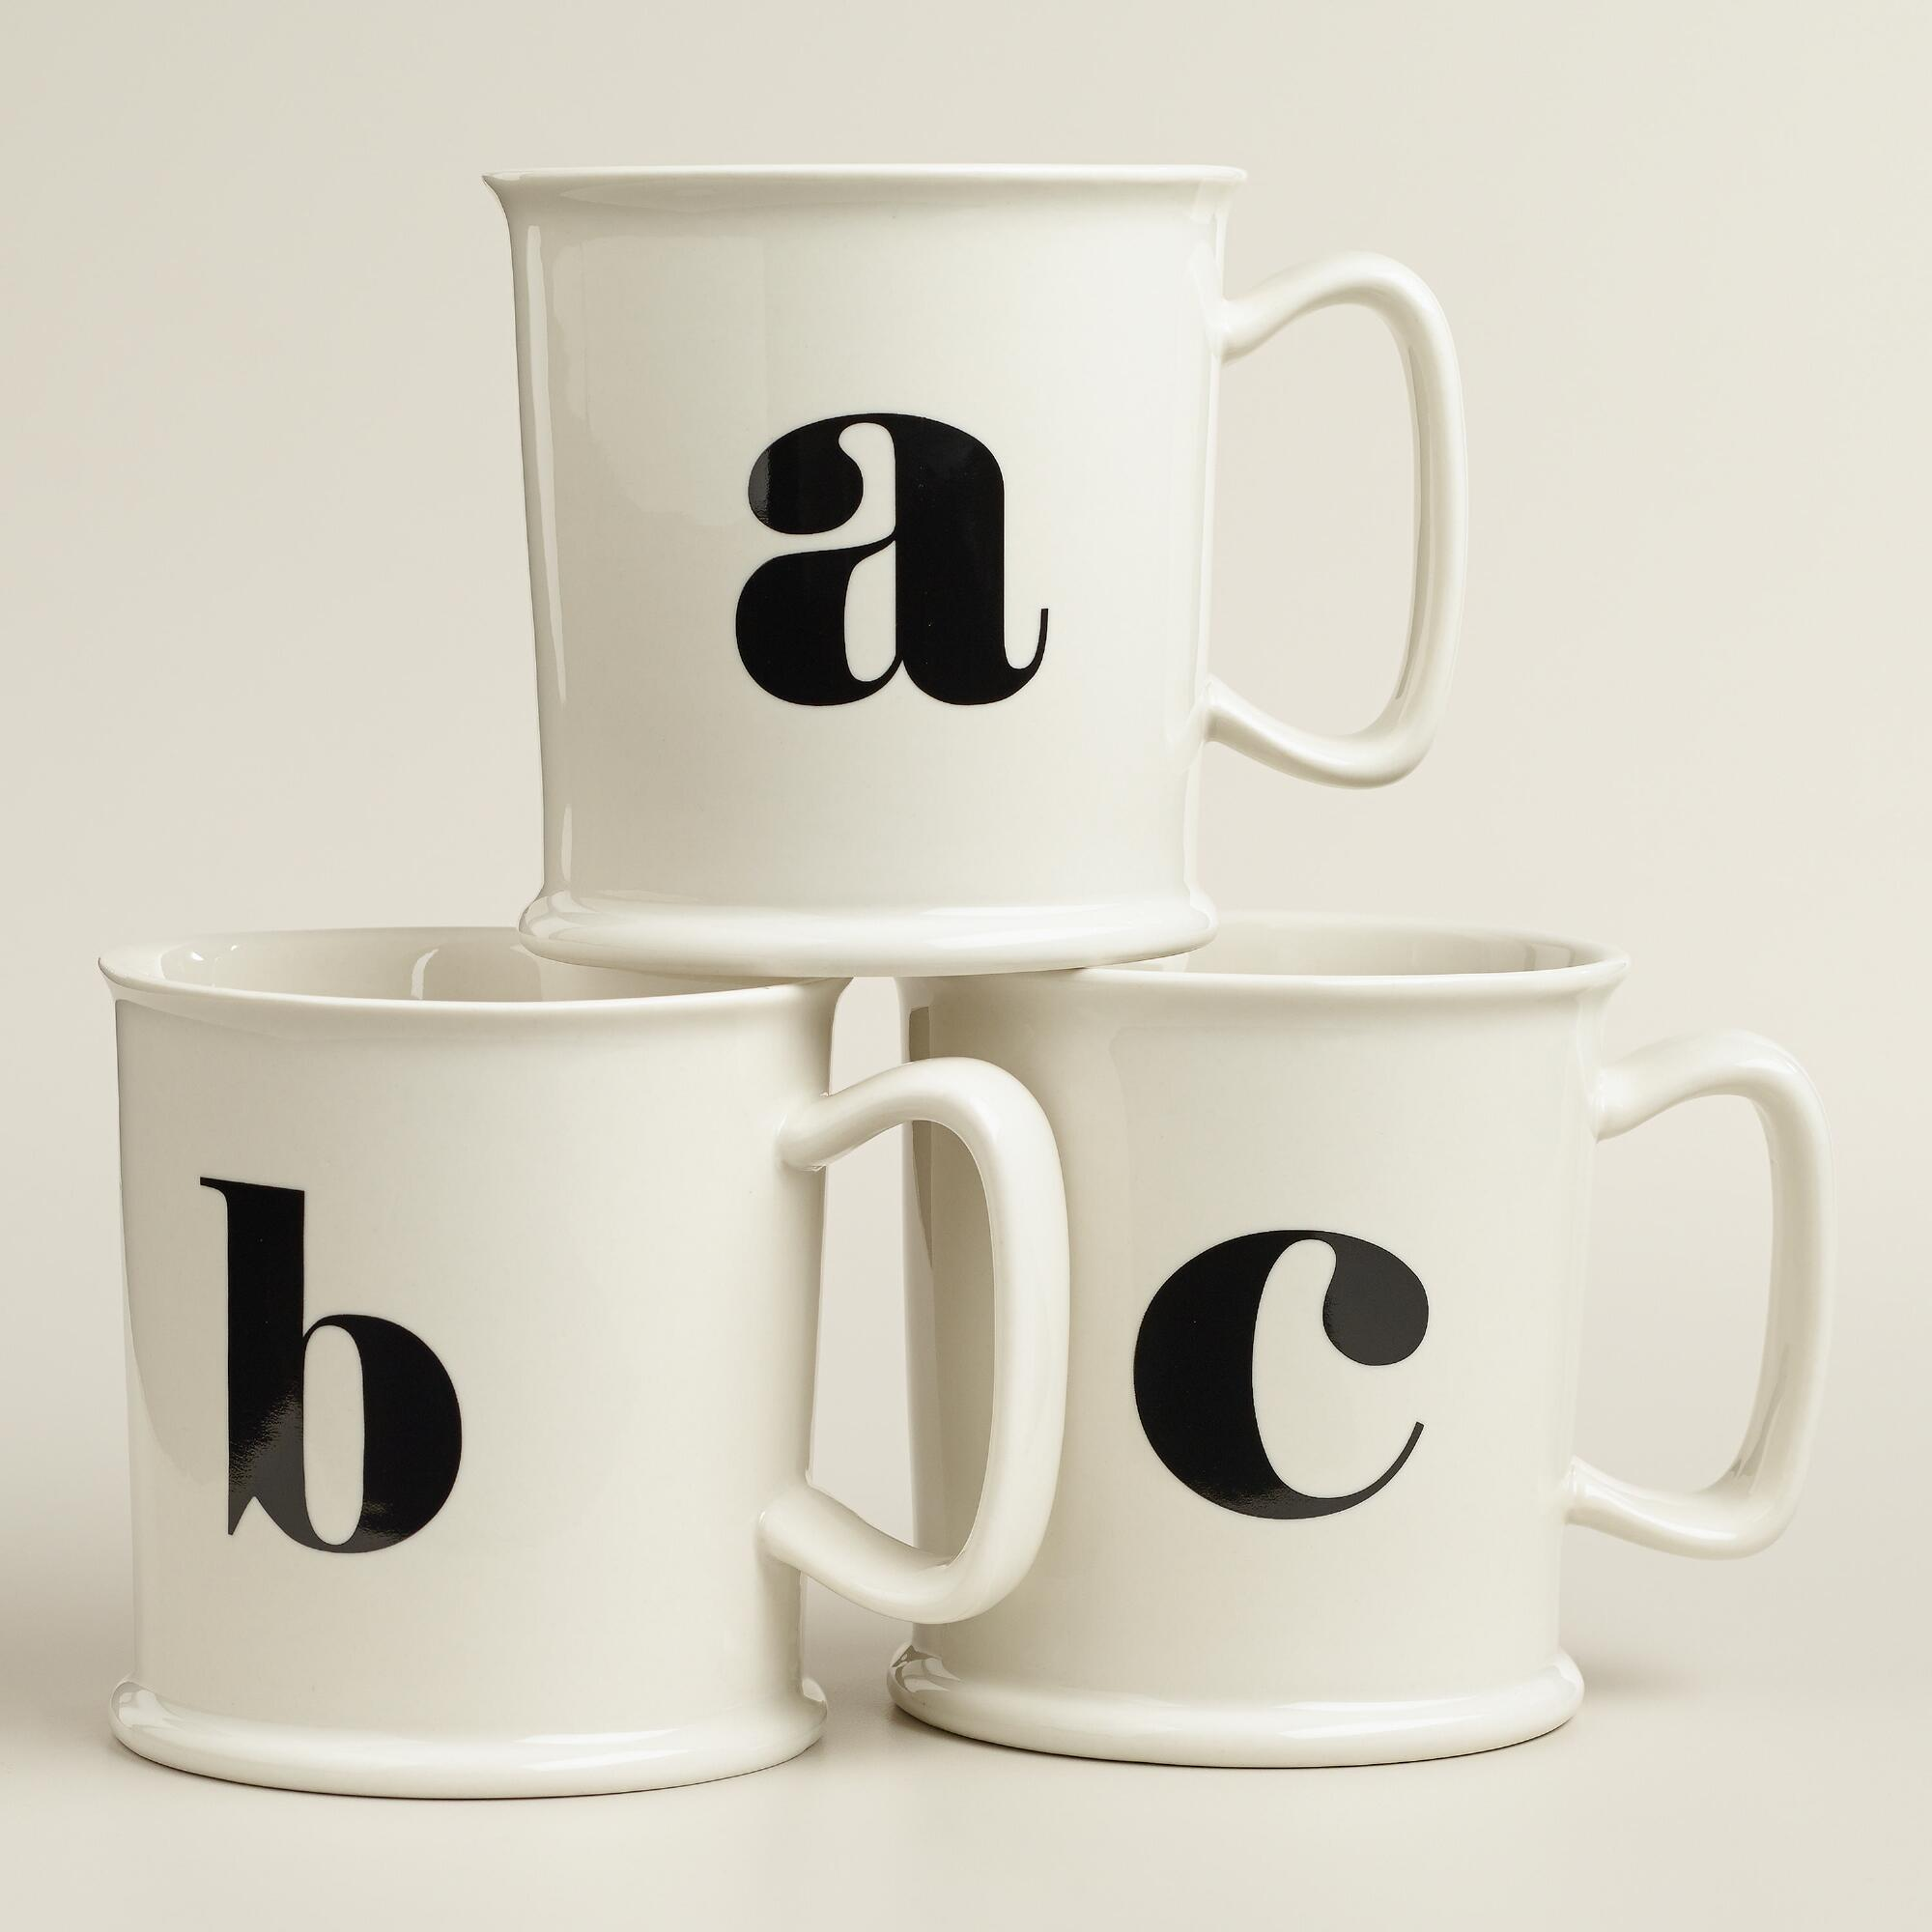 Monography Porcelain Mugs - World Market.jpg